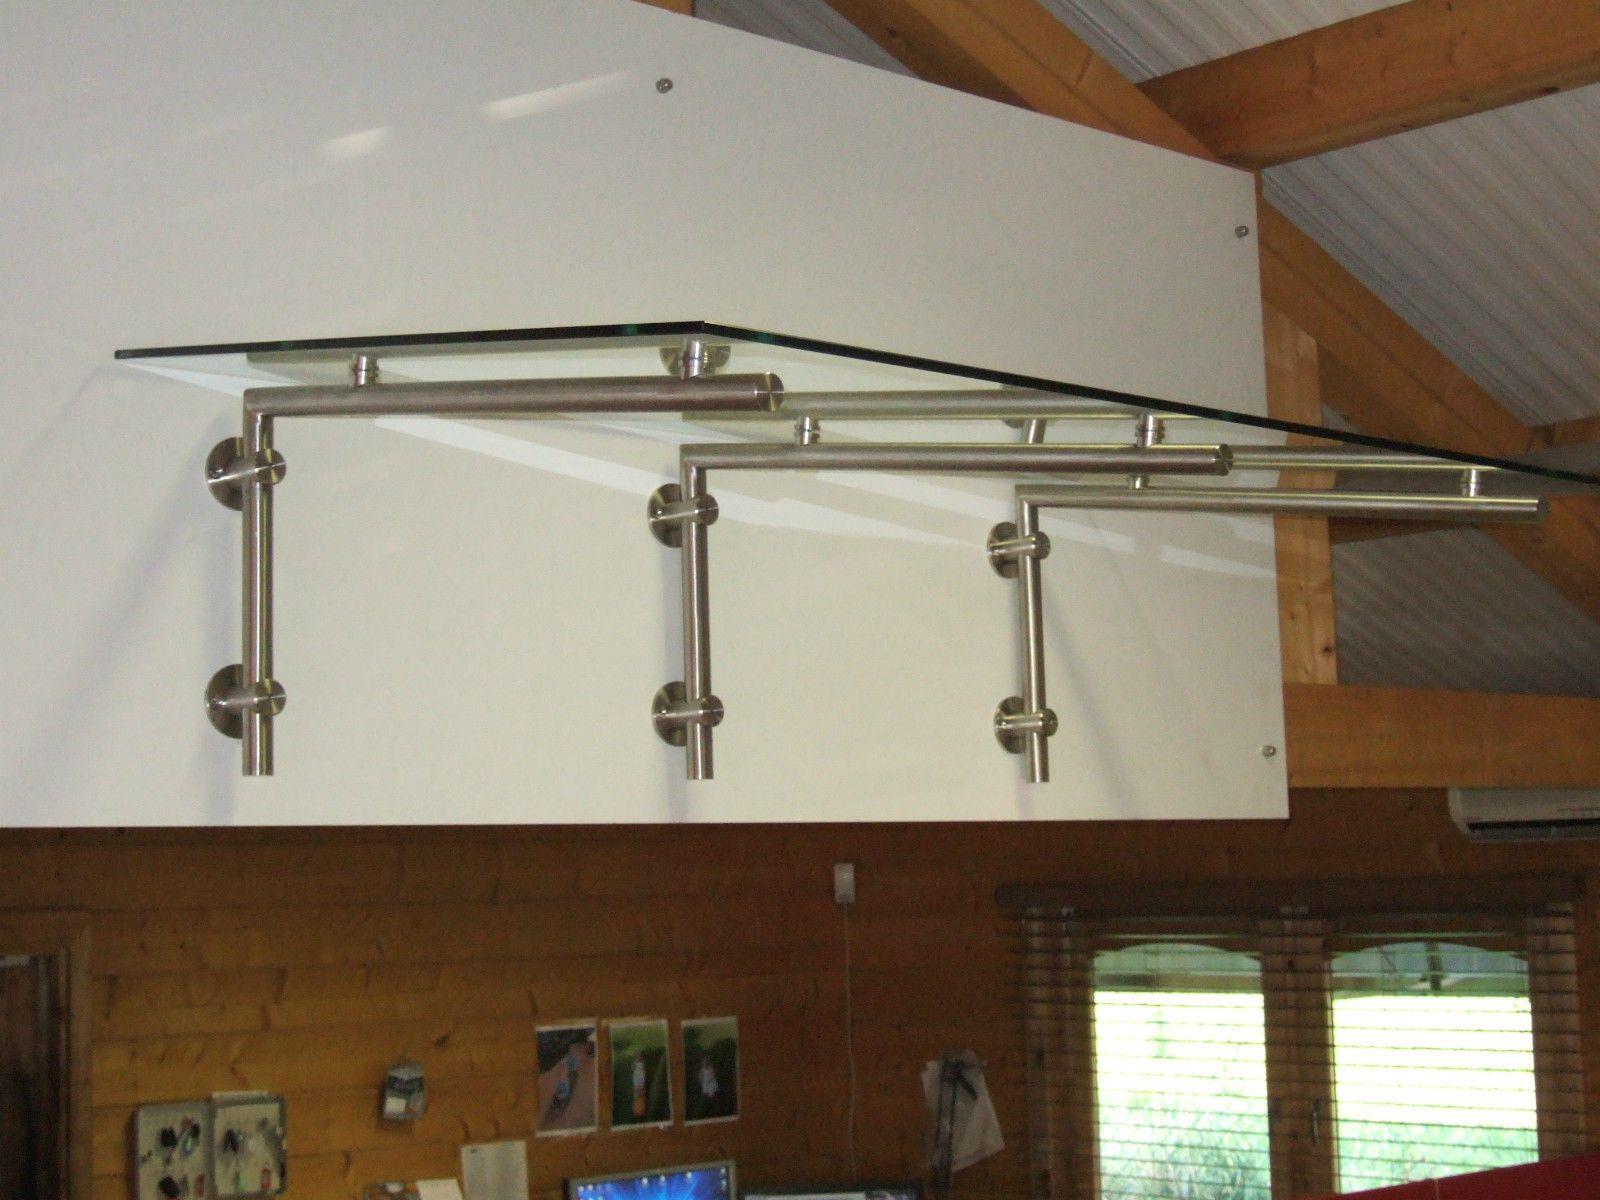 Stainless Steel Glass Door Canopy - L BRACKET (BRACKETS ONLY) | eBay & Stainless Steel Glass Door Canopy - L BRACKET (BRACKETS ONLY ...